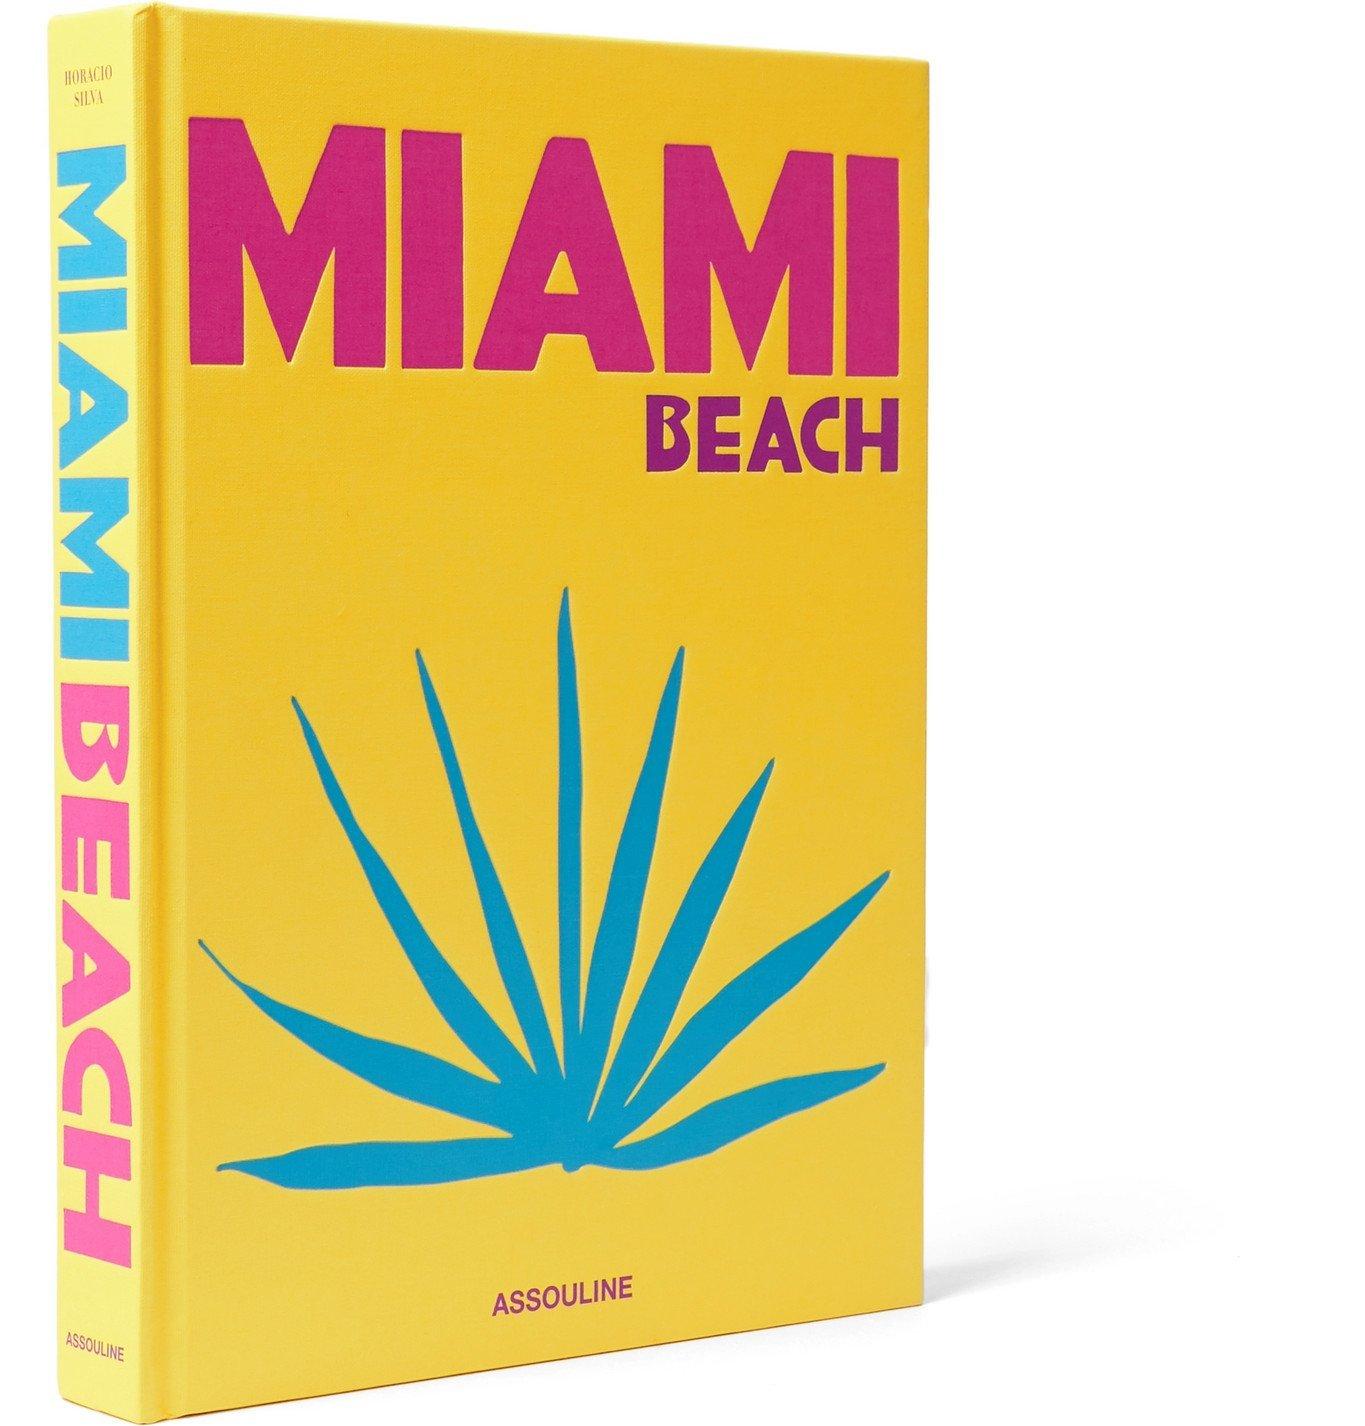 Photo: Assouline - Miami Beach Hardcover Book - Yellow